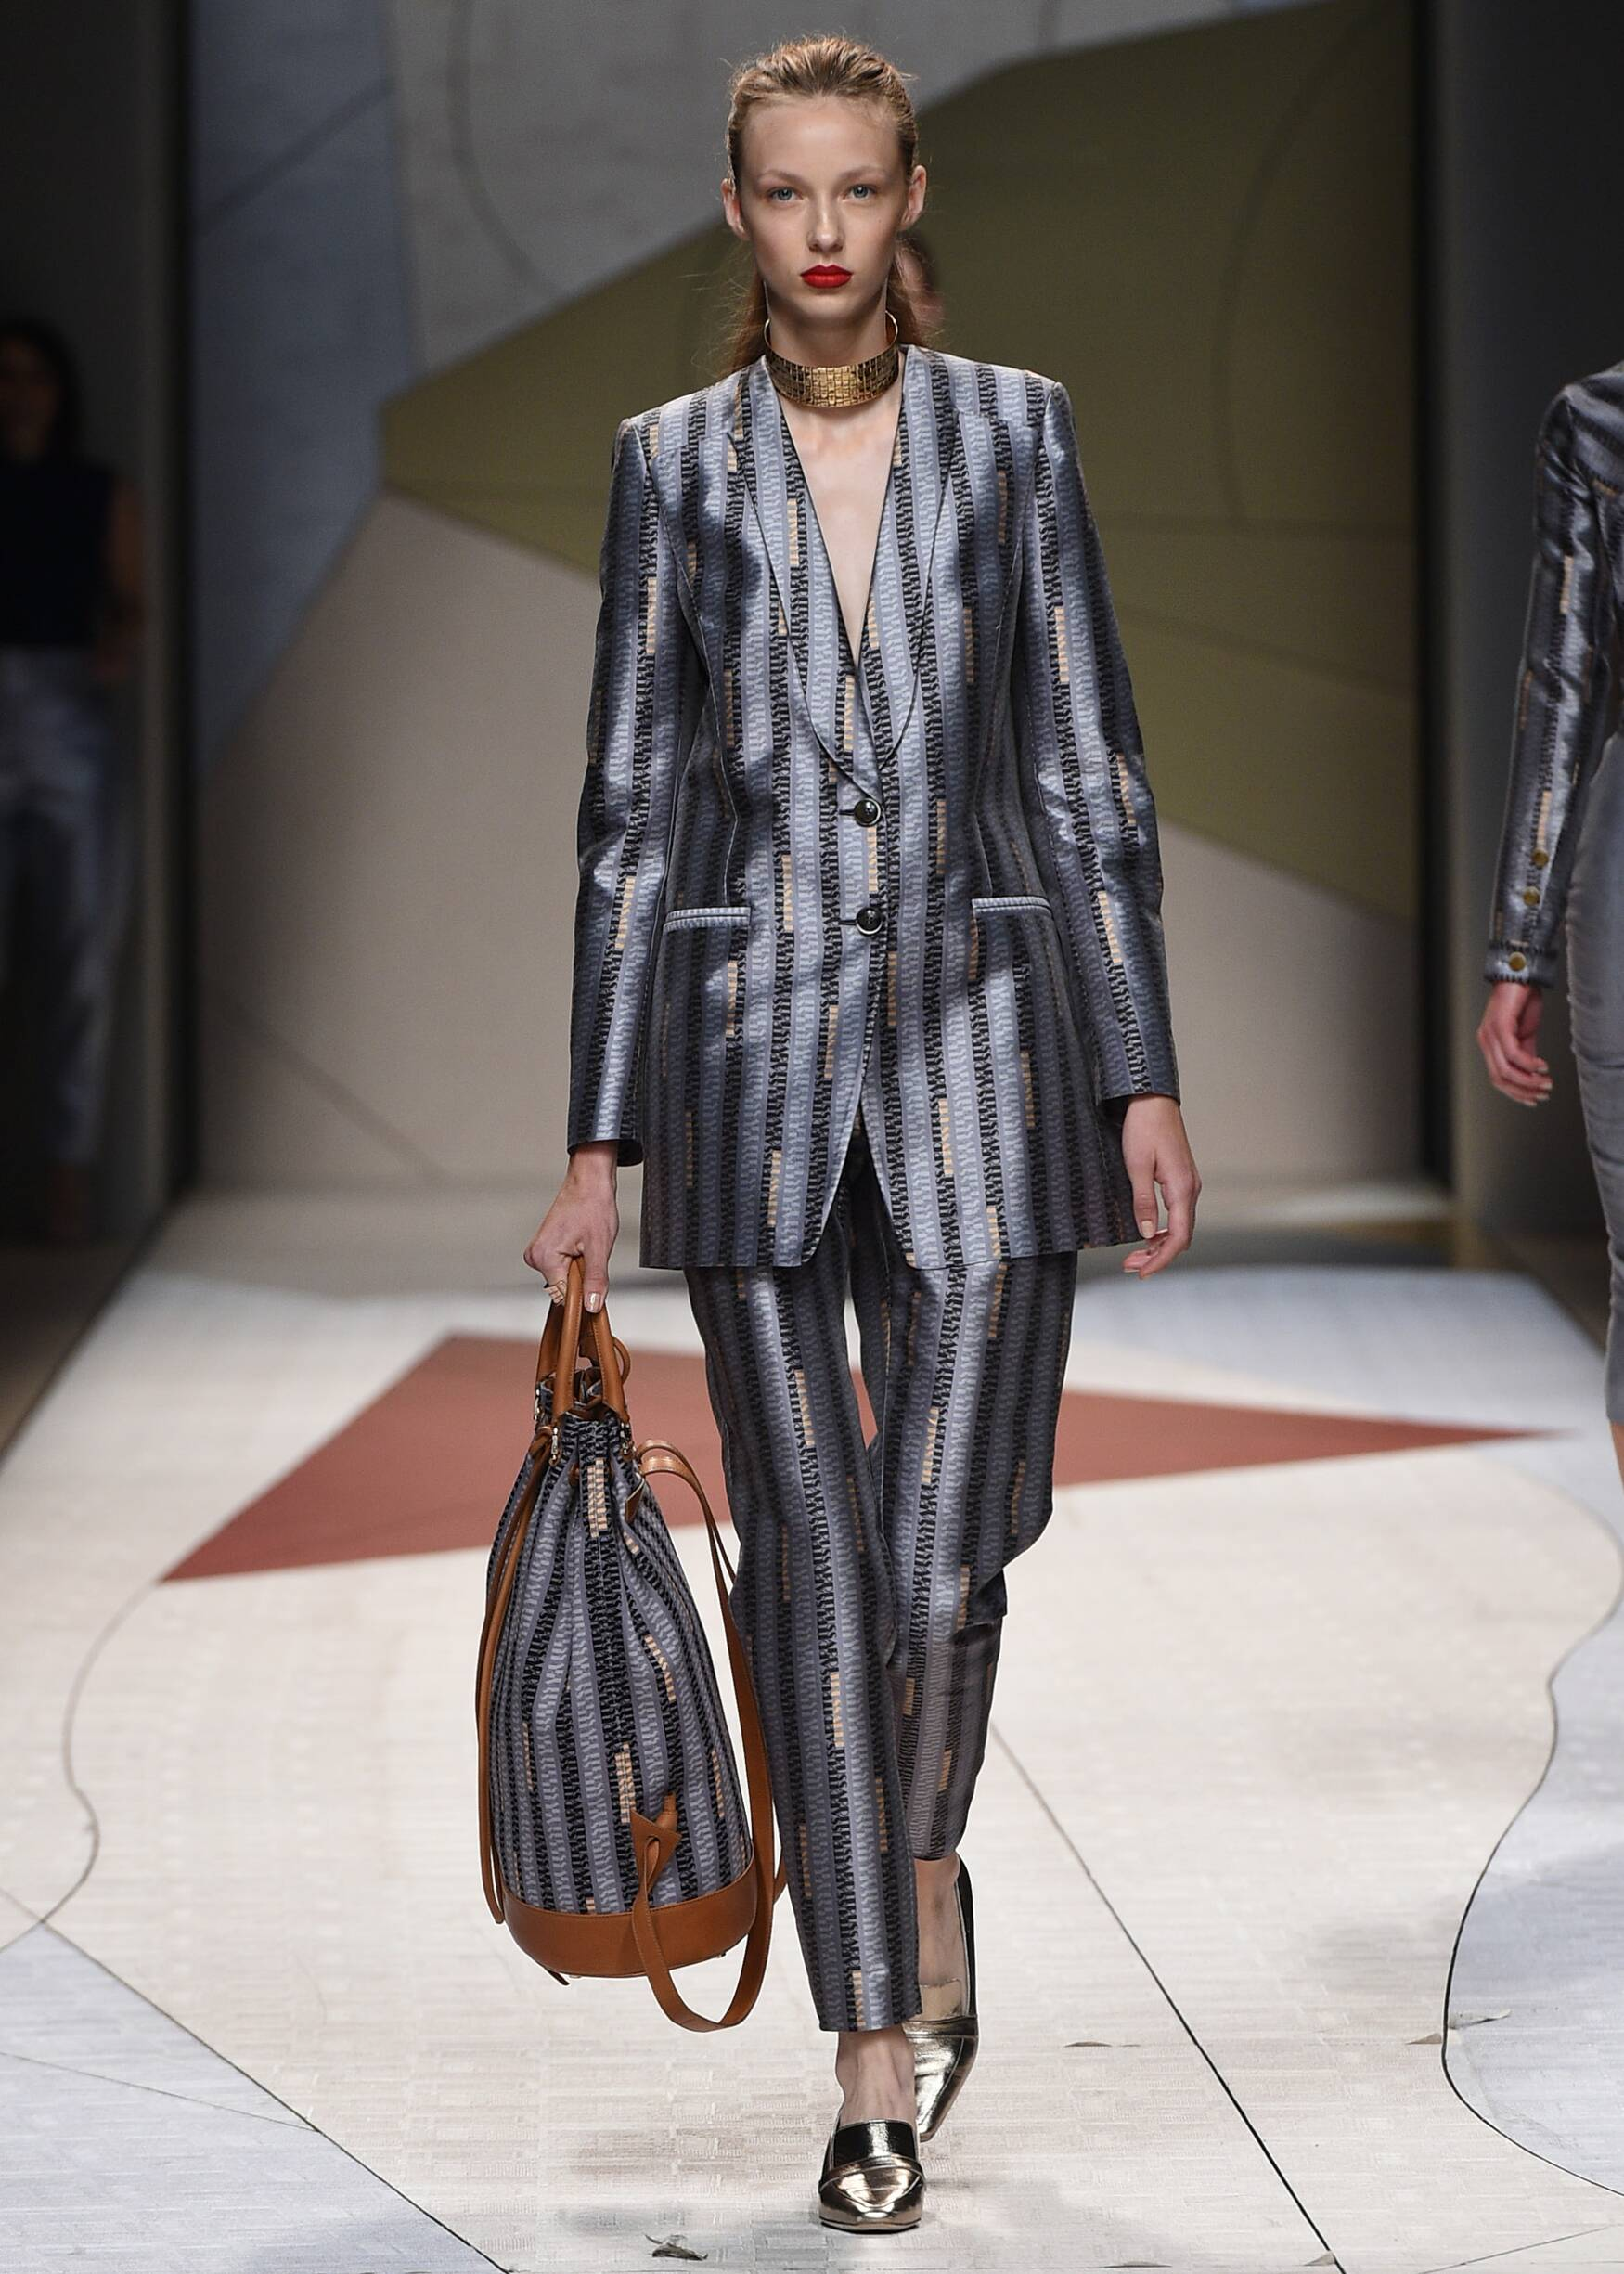 Fashion Model Trussardi Catwalk